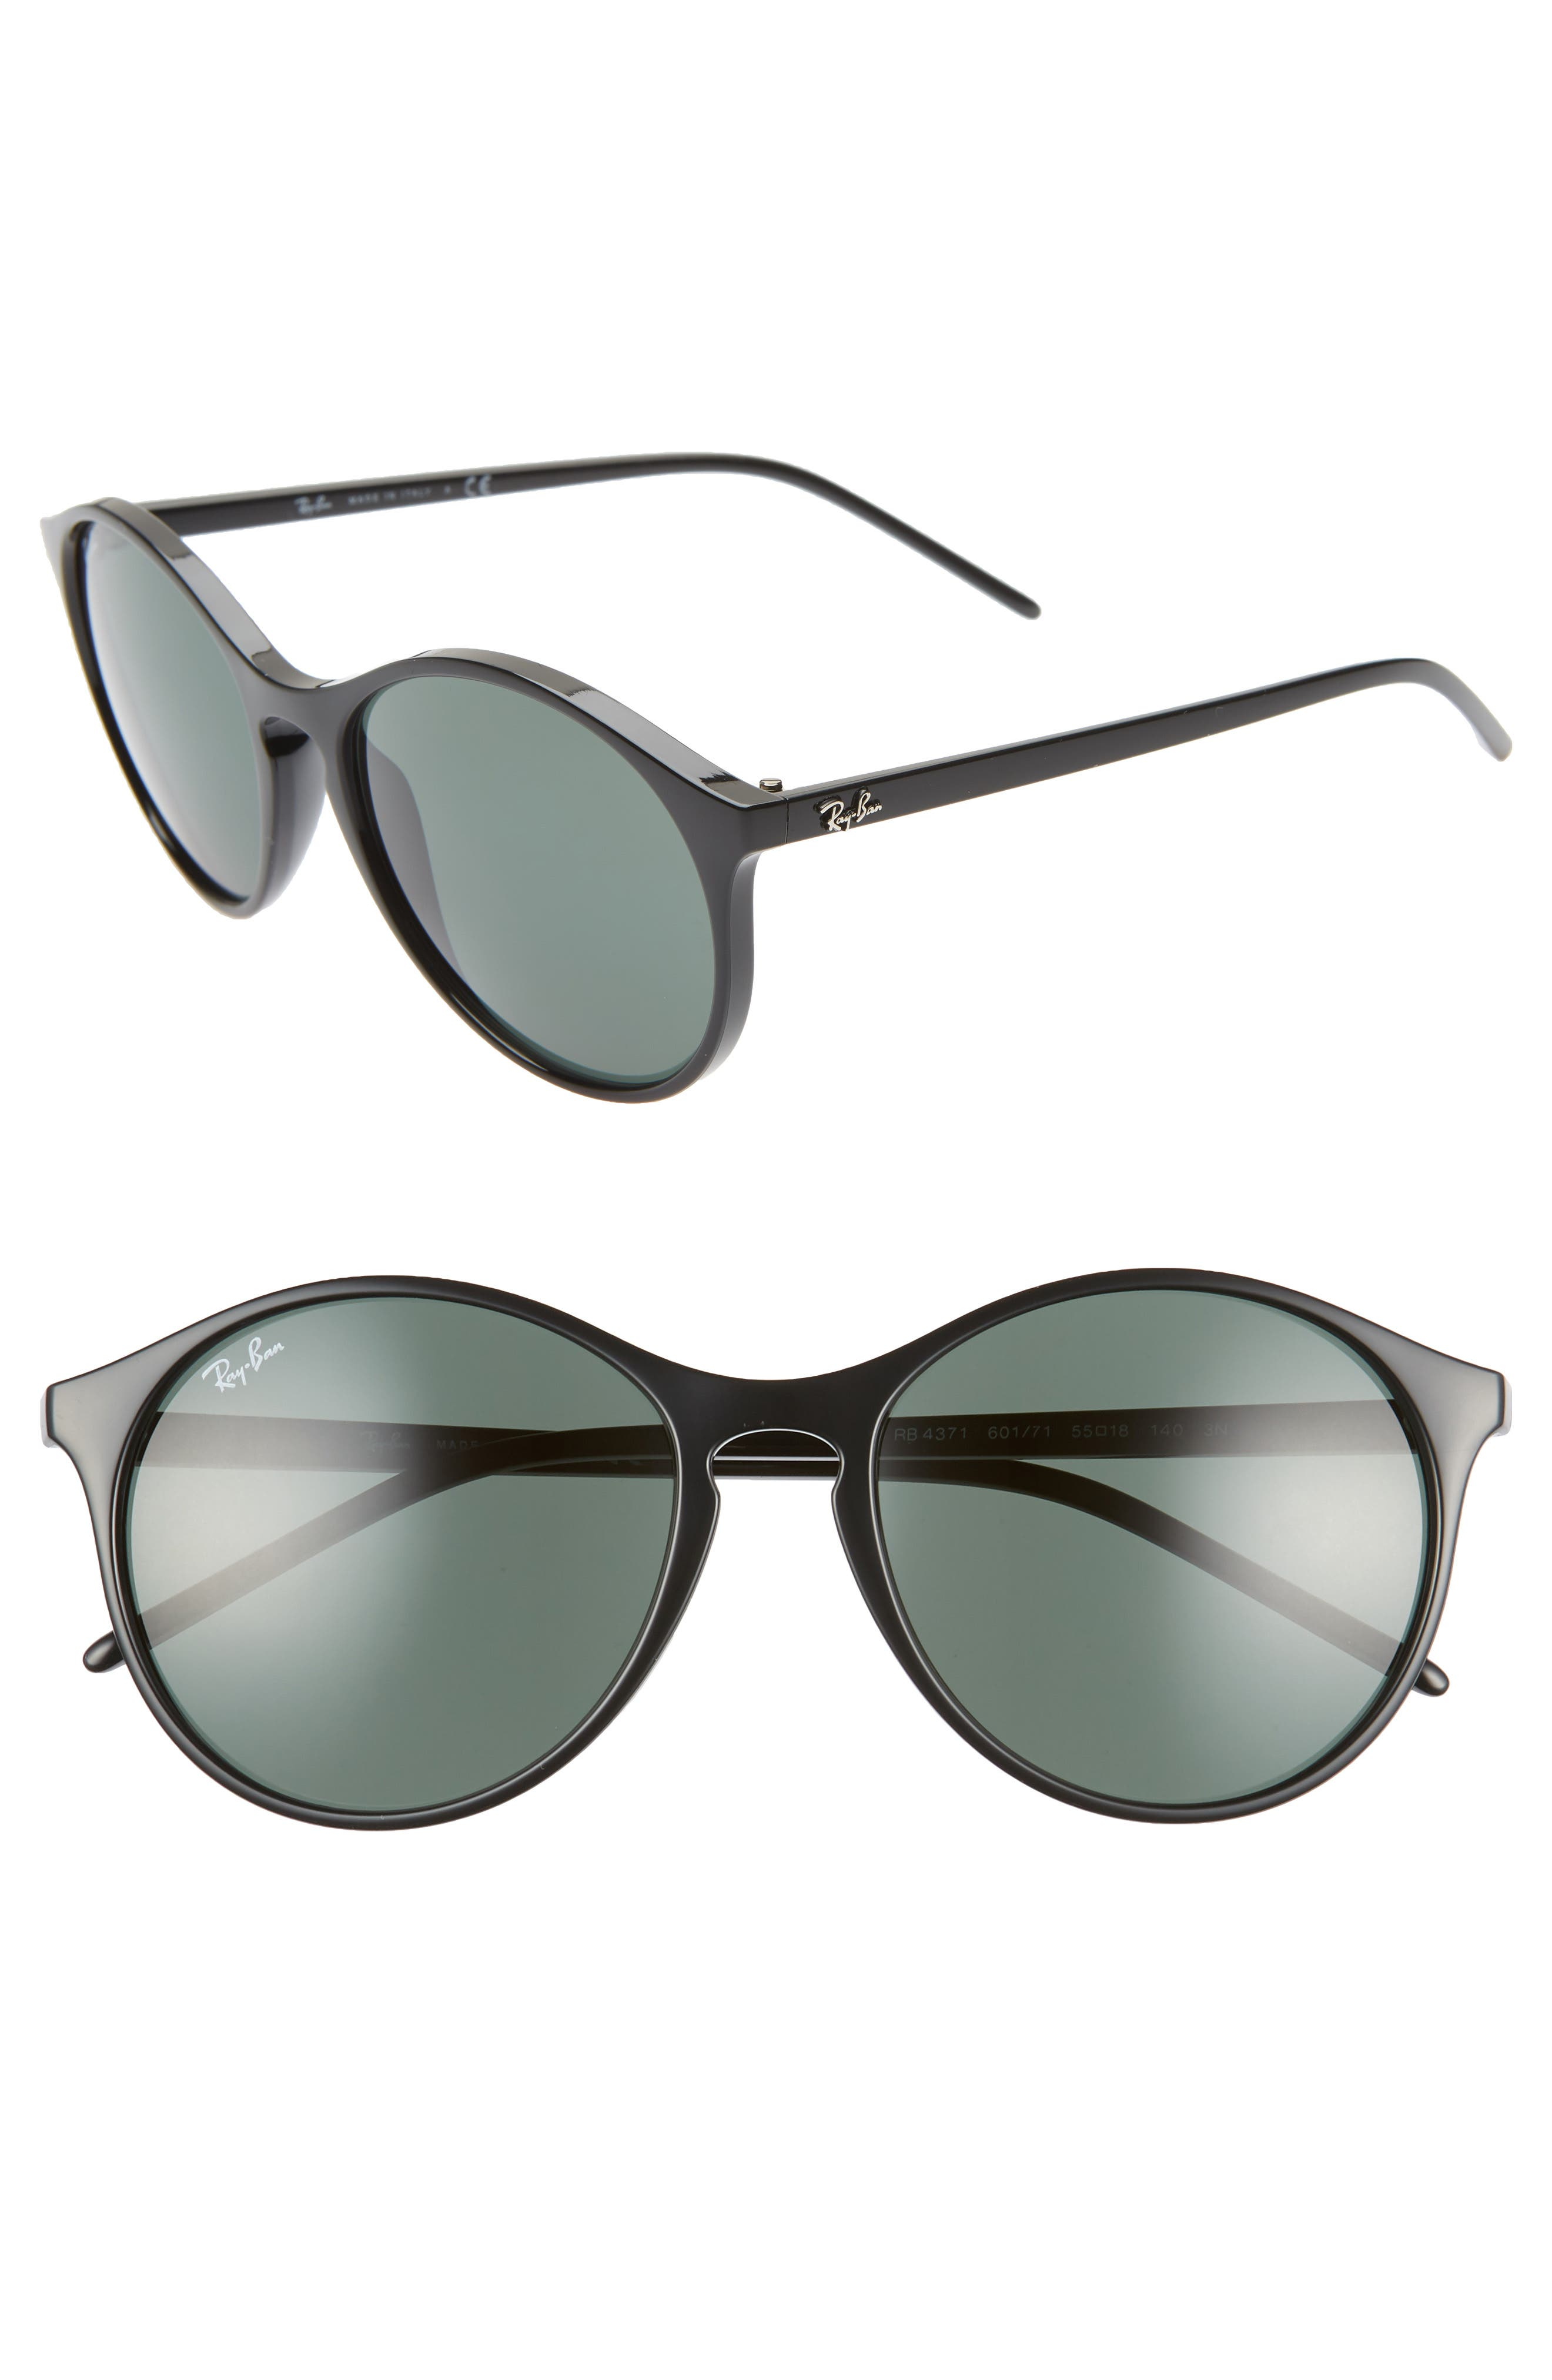 RAY-BAN, Highstreet 55mm Round Sunglasses, Main thumbnail 1, color, BLACK/ GREEN SOLID